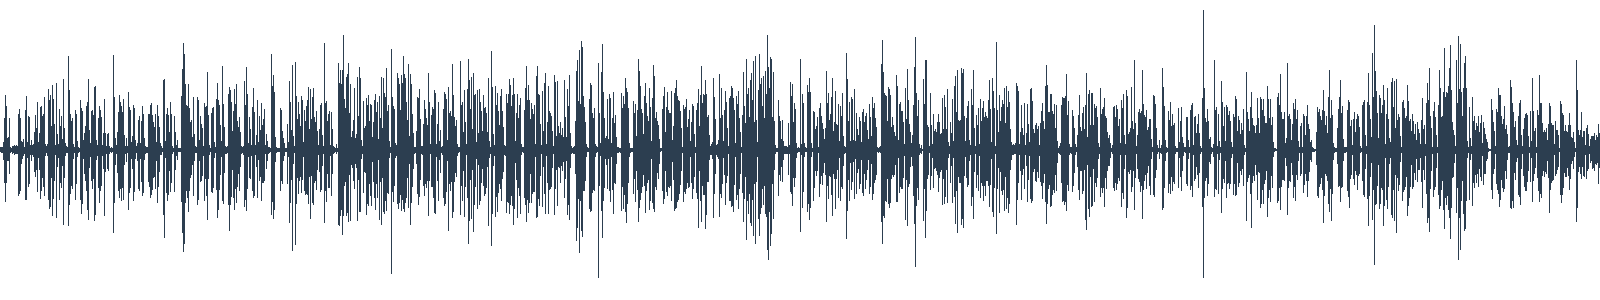 O MODLITBE (1) - Ranná modlitba waveform